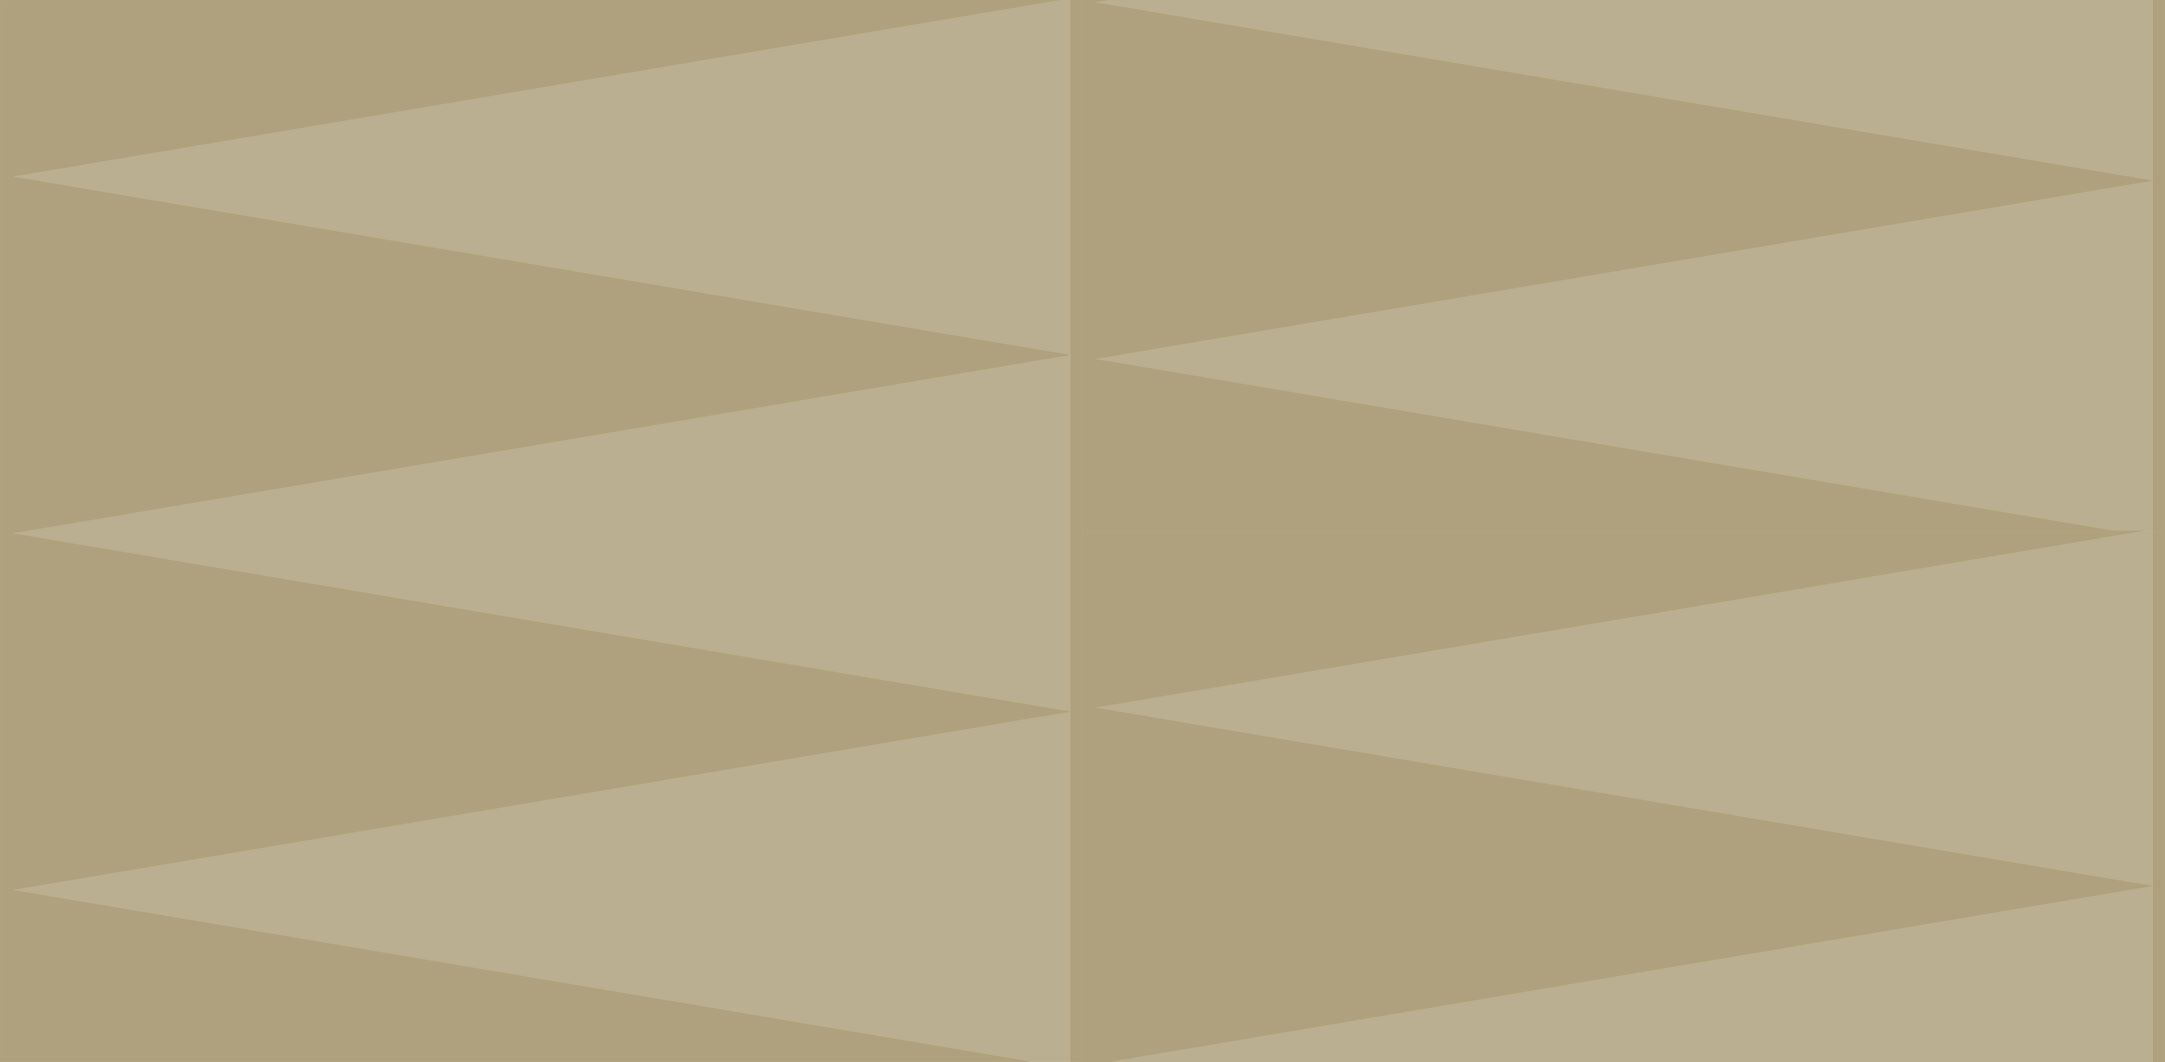 Английские обои Cole & Son,  коллекция Geometric, артикул93/3011